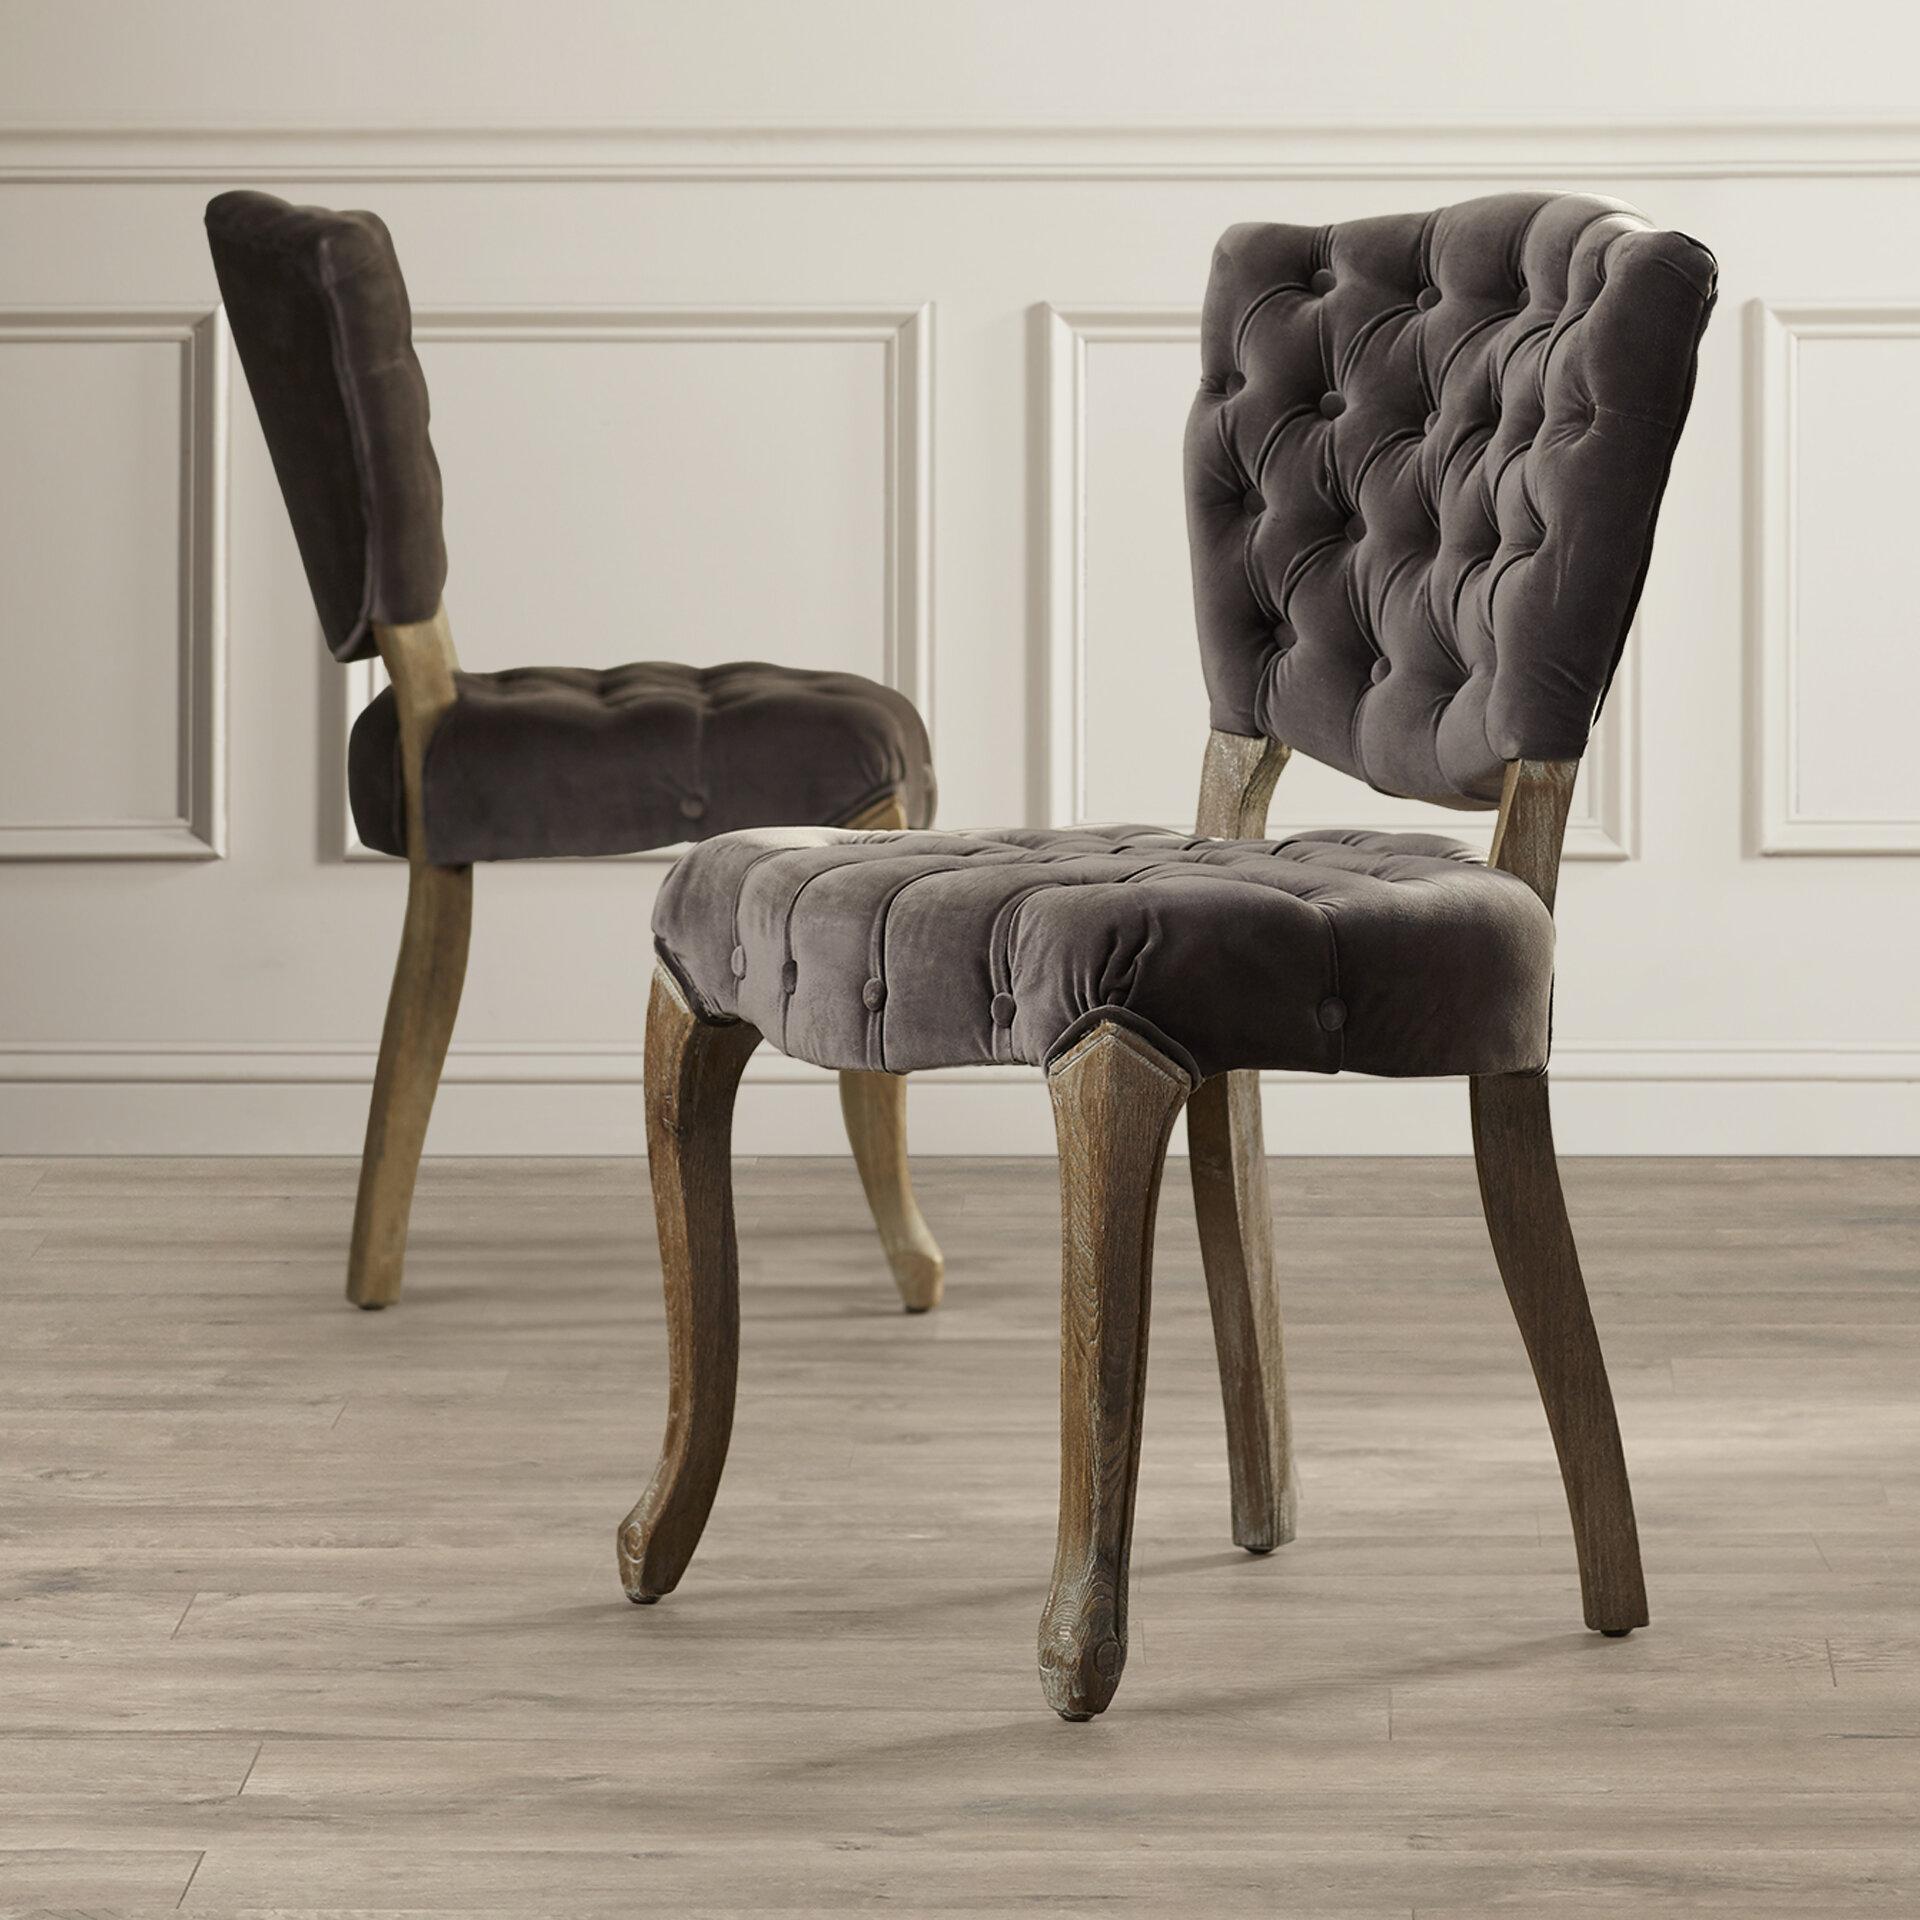 Excellent Therrien Upholstered Dining Chair Short Links Chair Design For Home Short Linksinfo